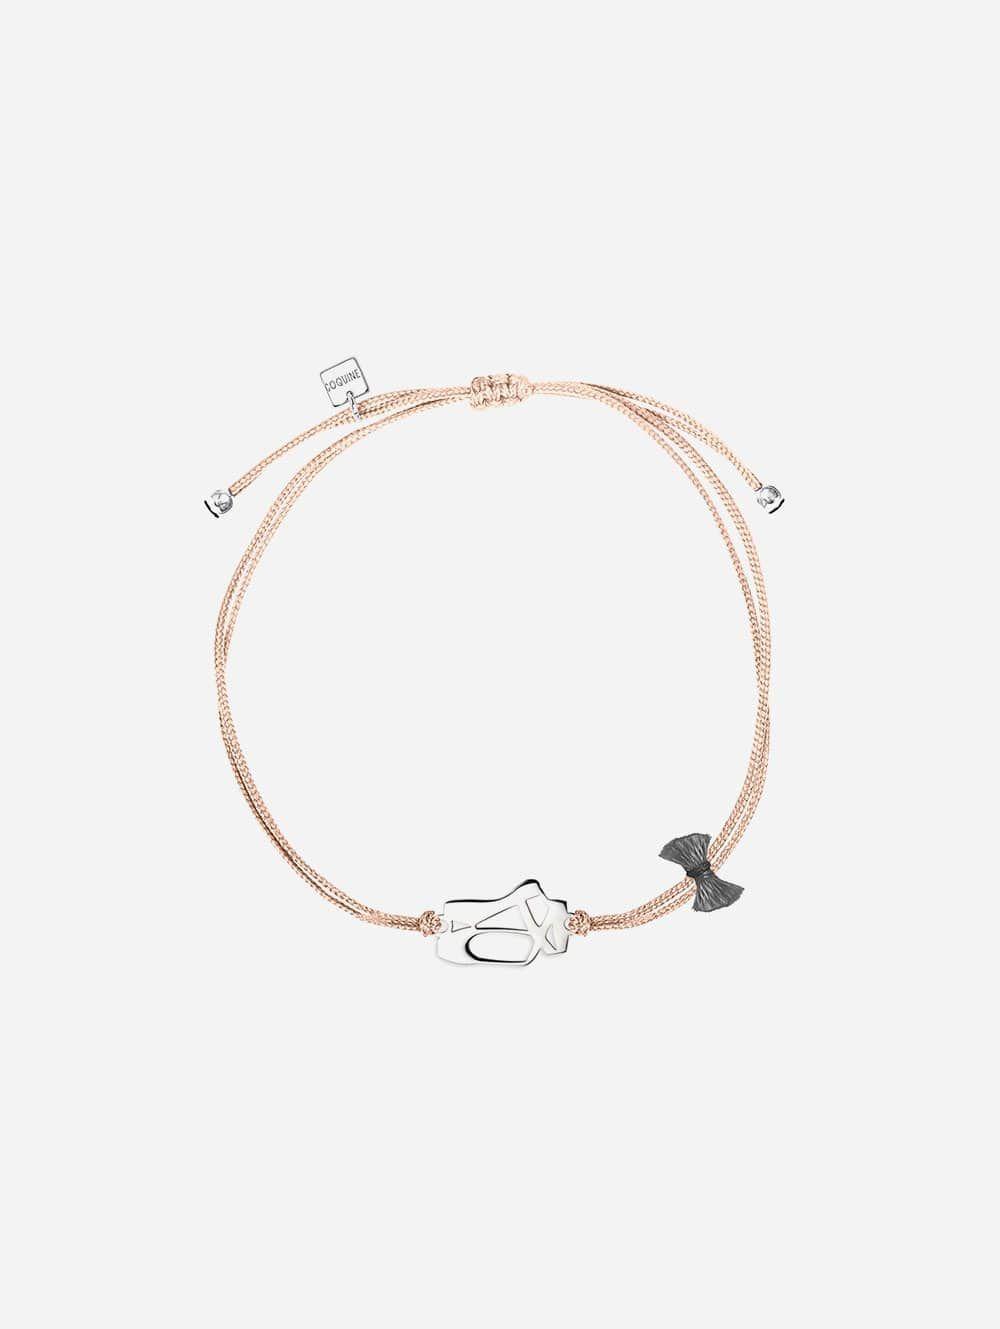 Silver Bracelet Ballerina-Linen String | Coquine Jewelry